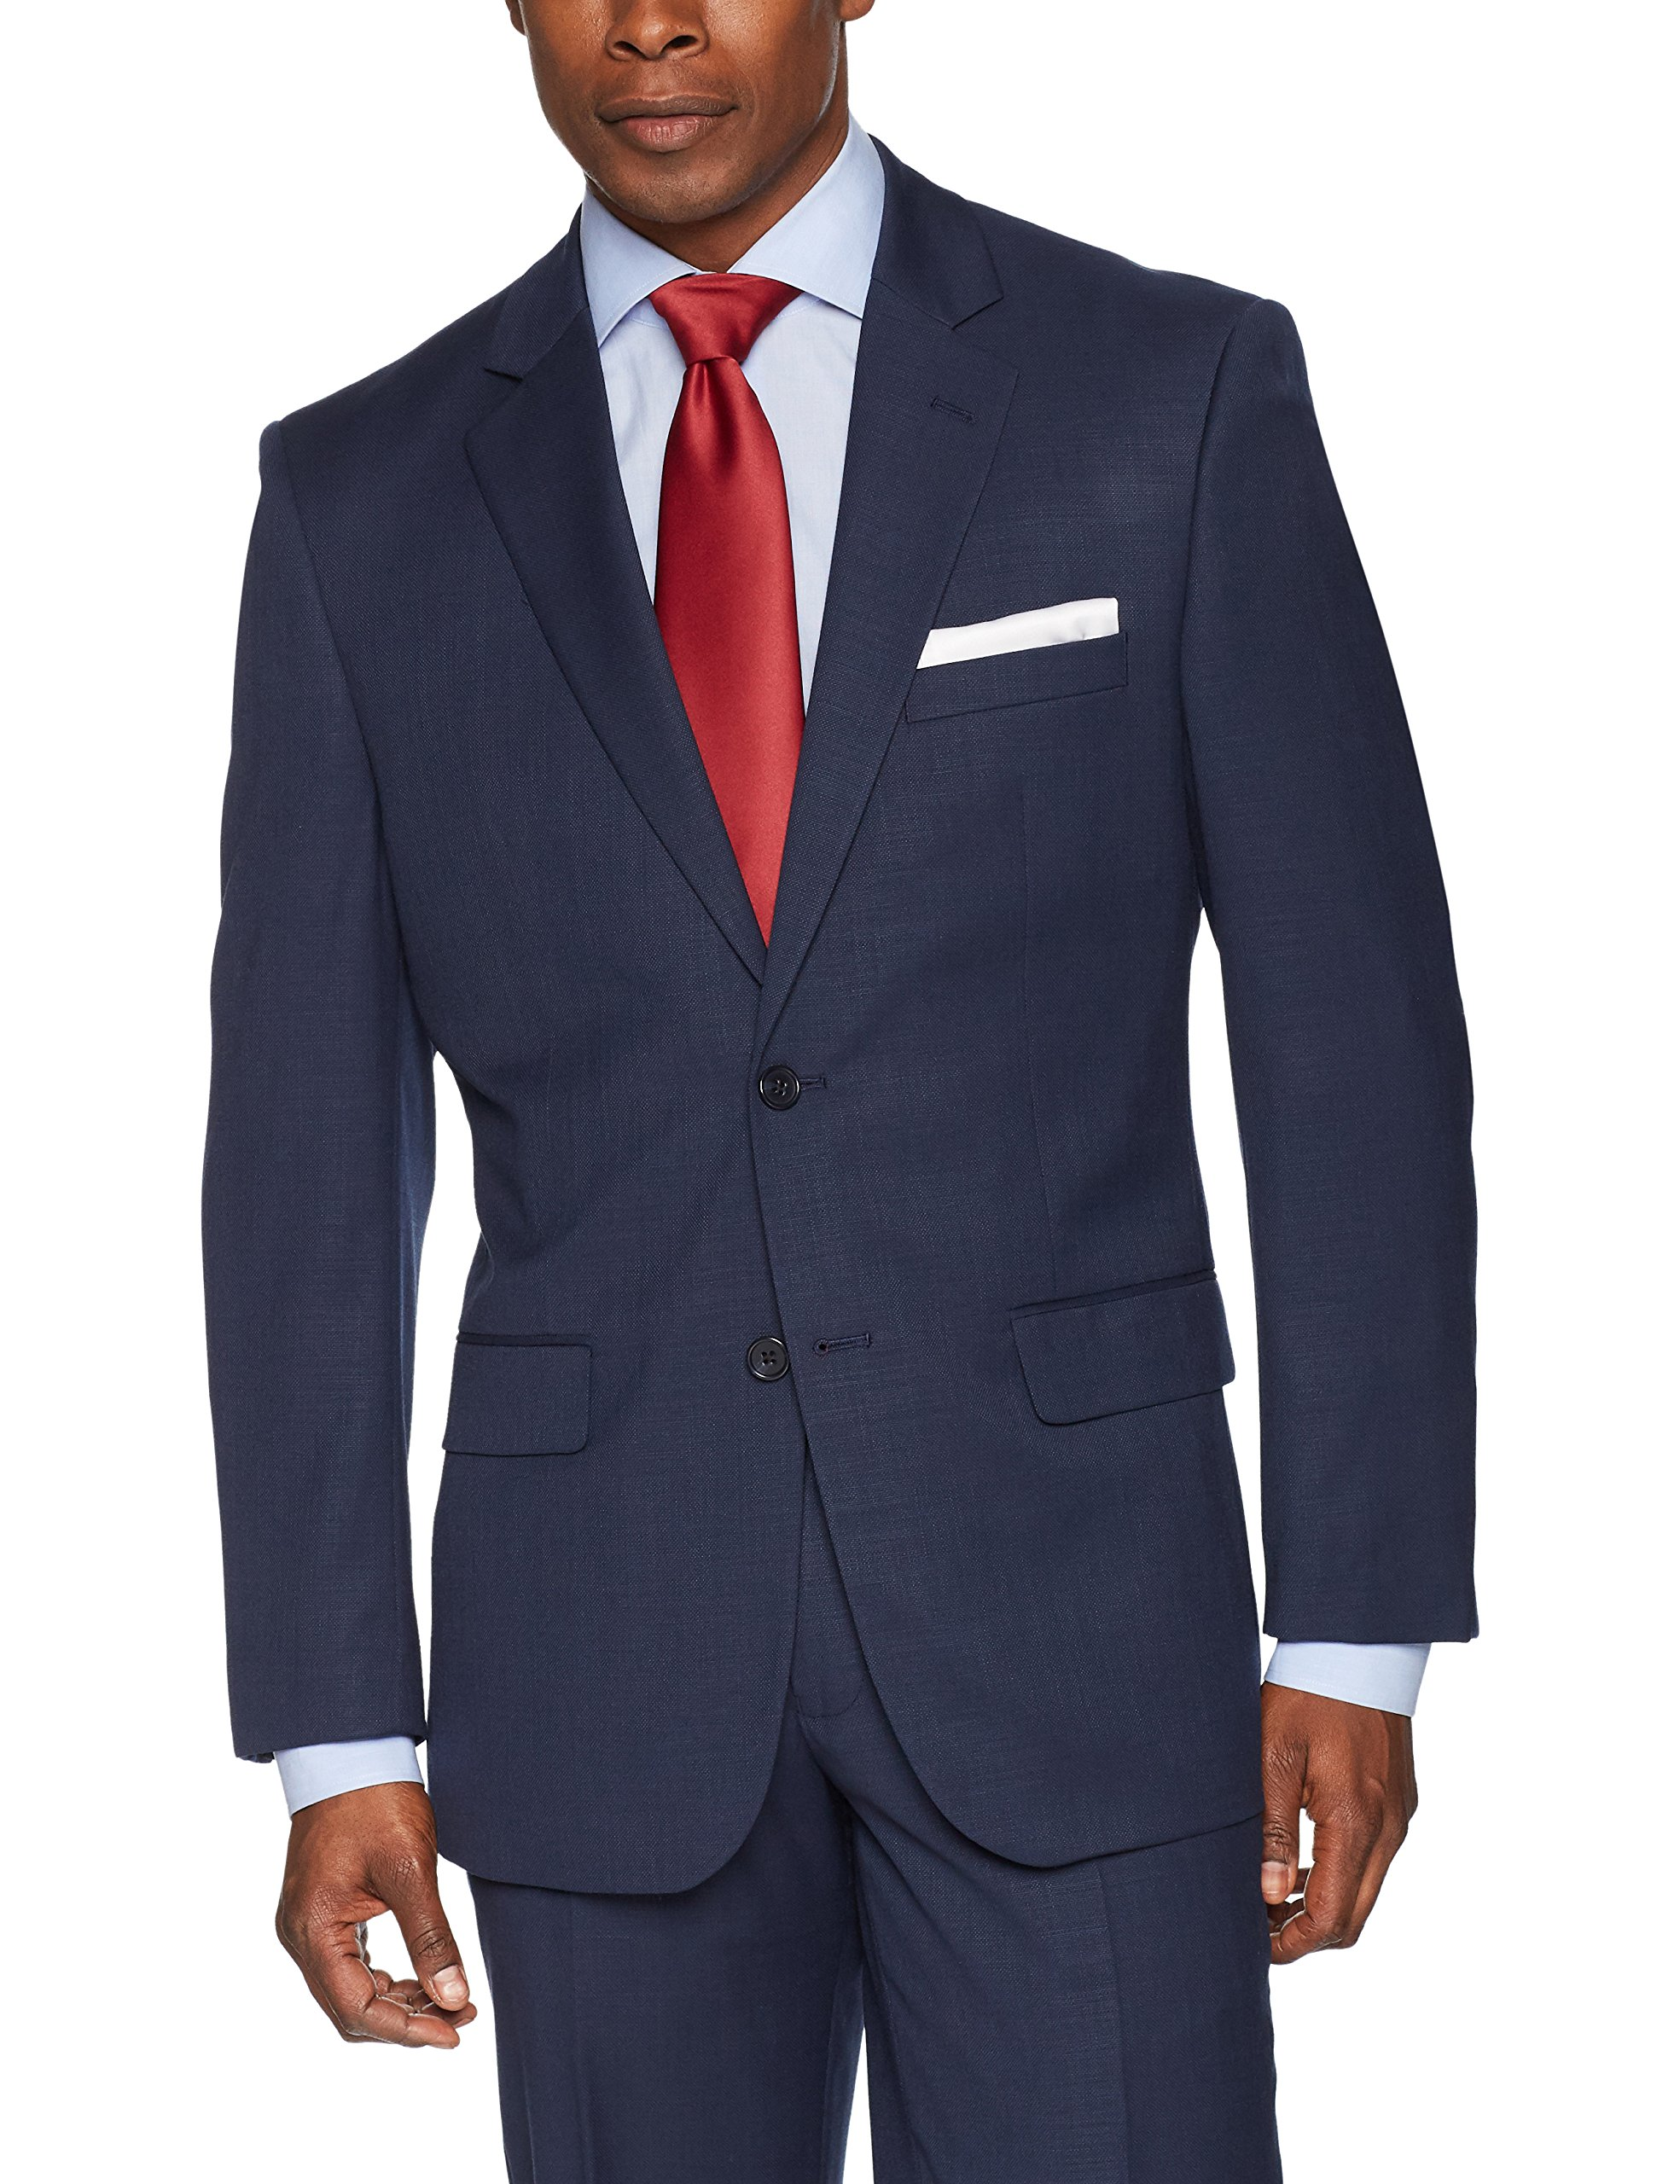 Jones New York Men's Suit Separate Blazer (Blazer and Pant), Navy, 38R by Jones New York